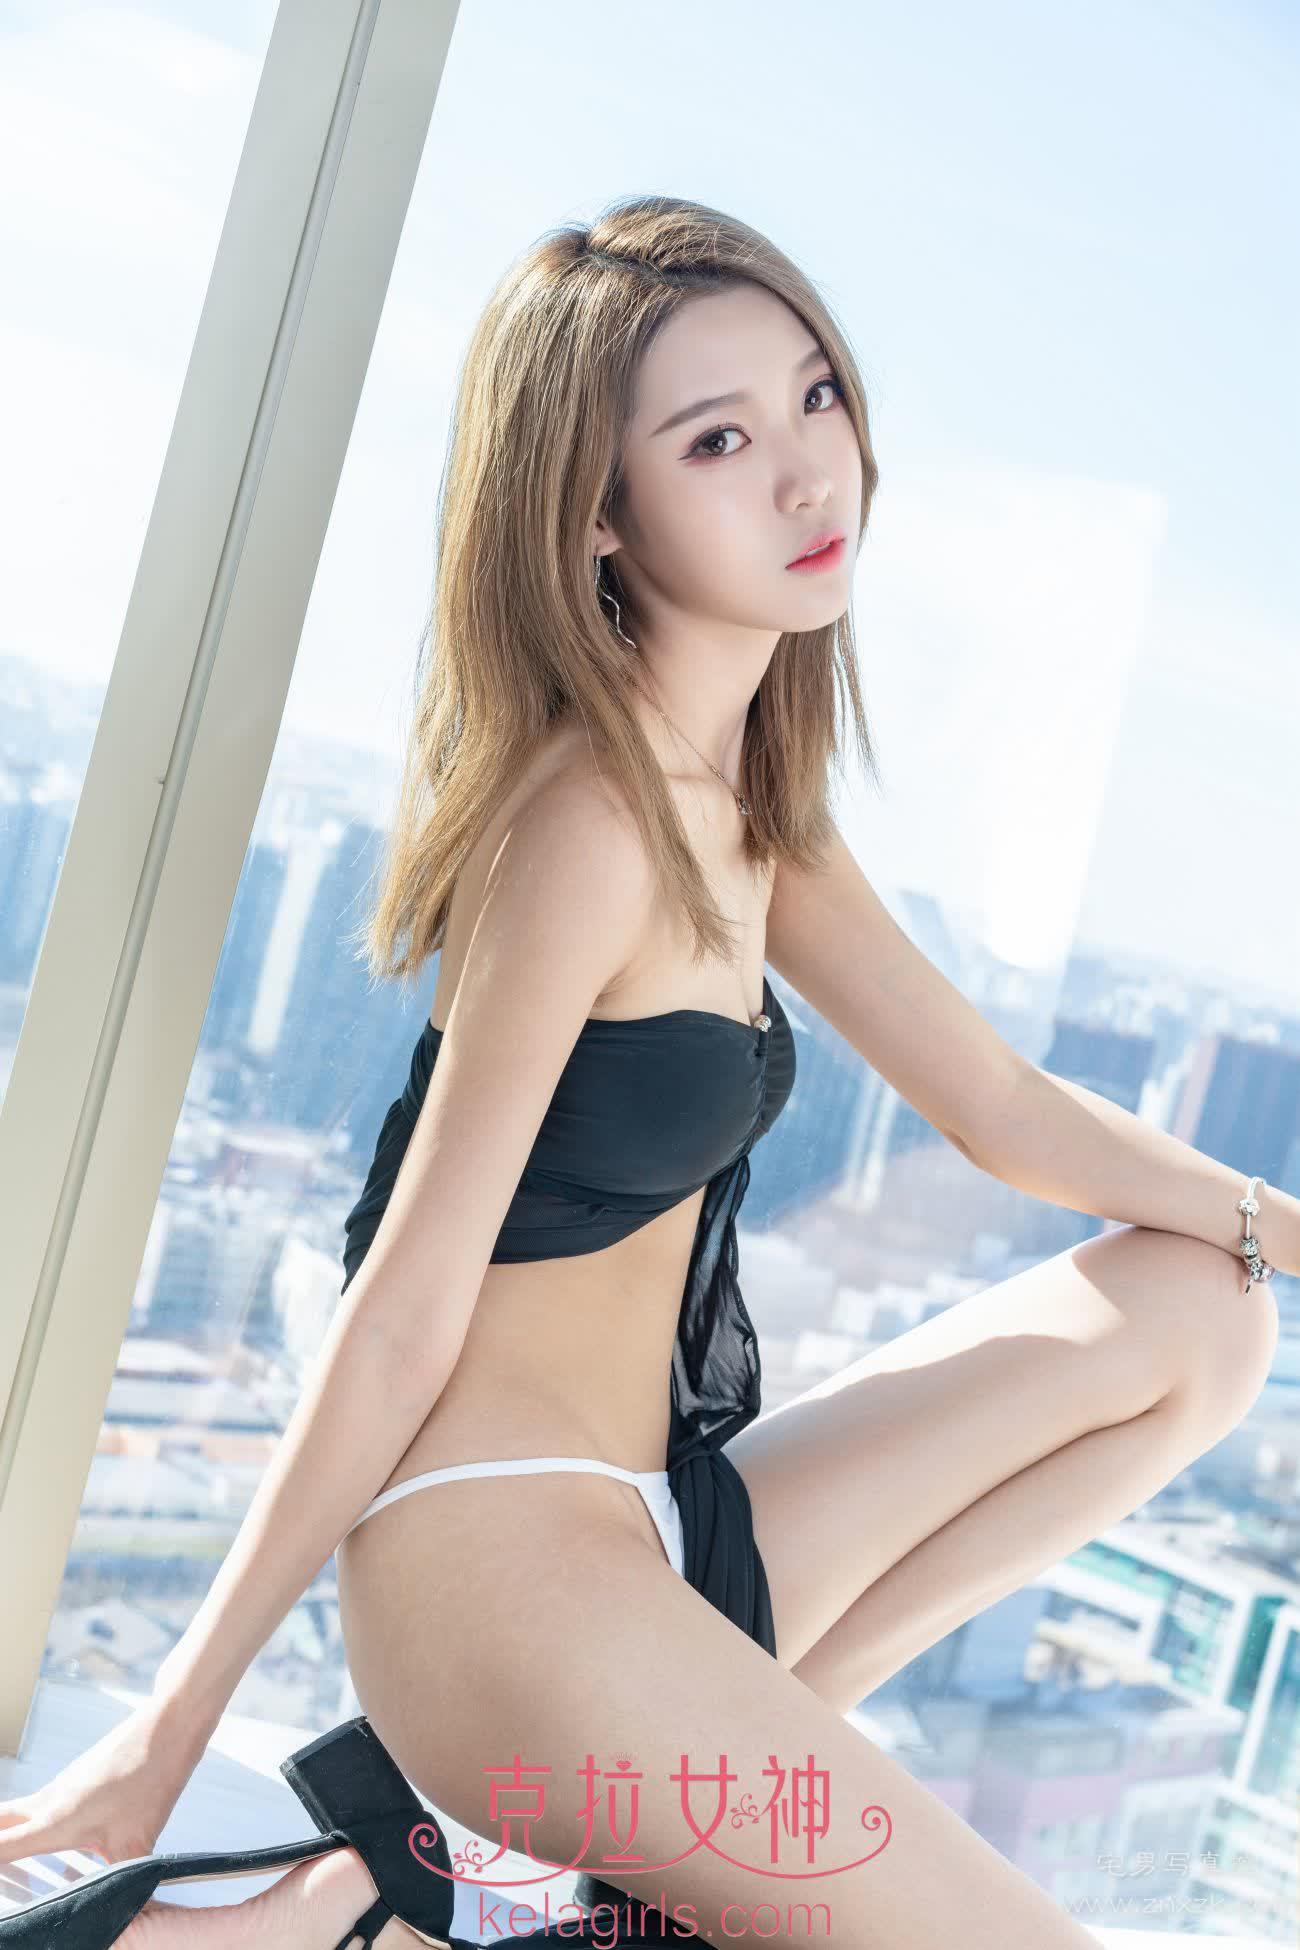 Kelagirls克拉女神 2019.11.11 热辣の黑裙 周迪